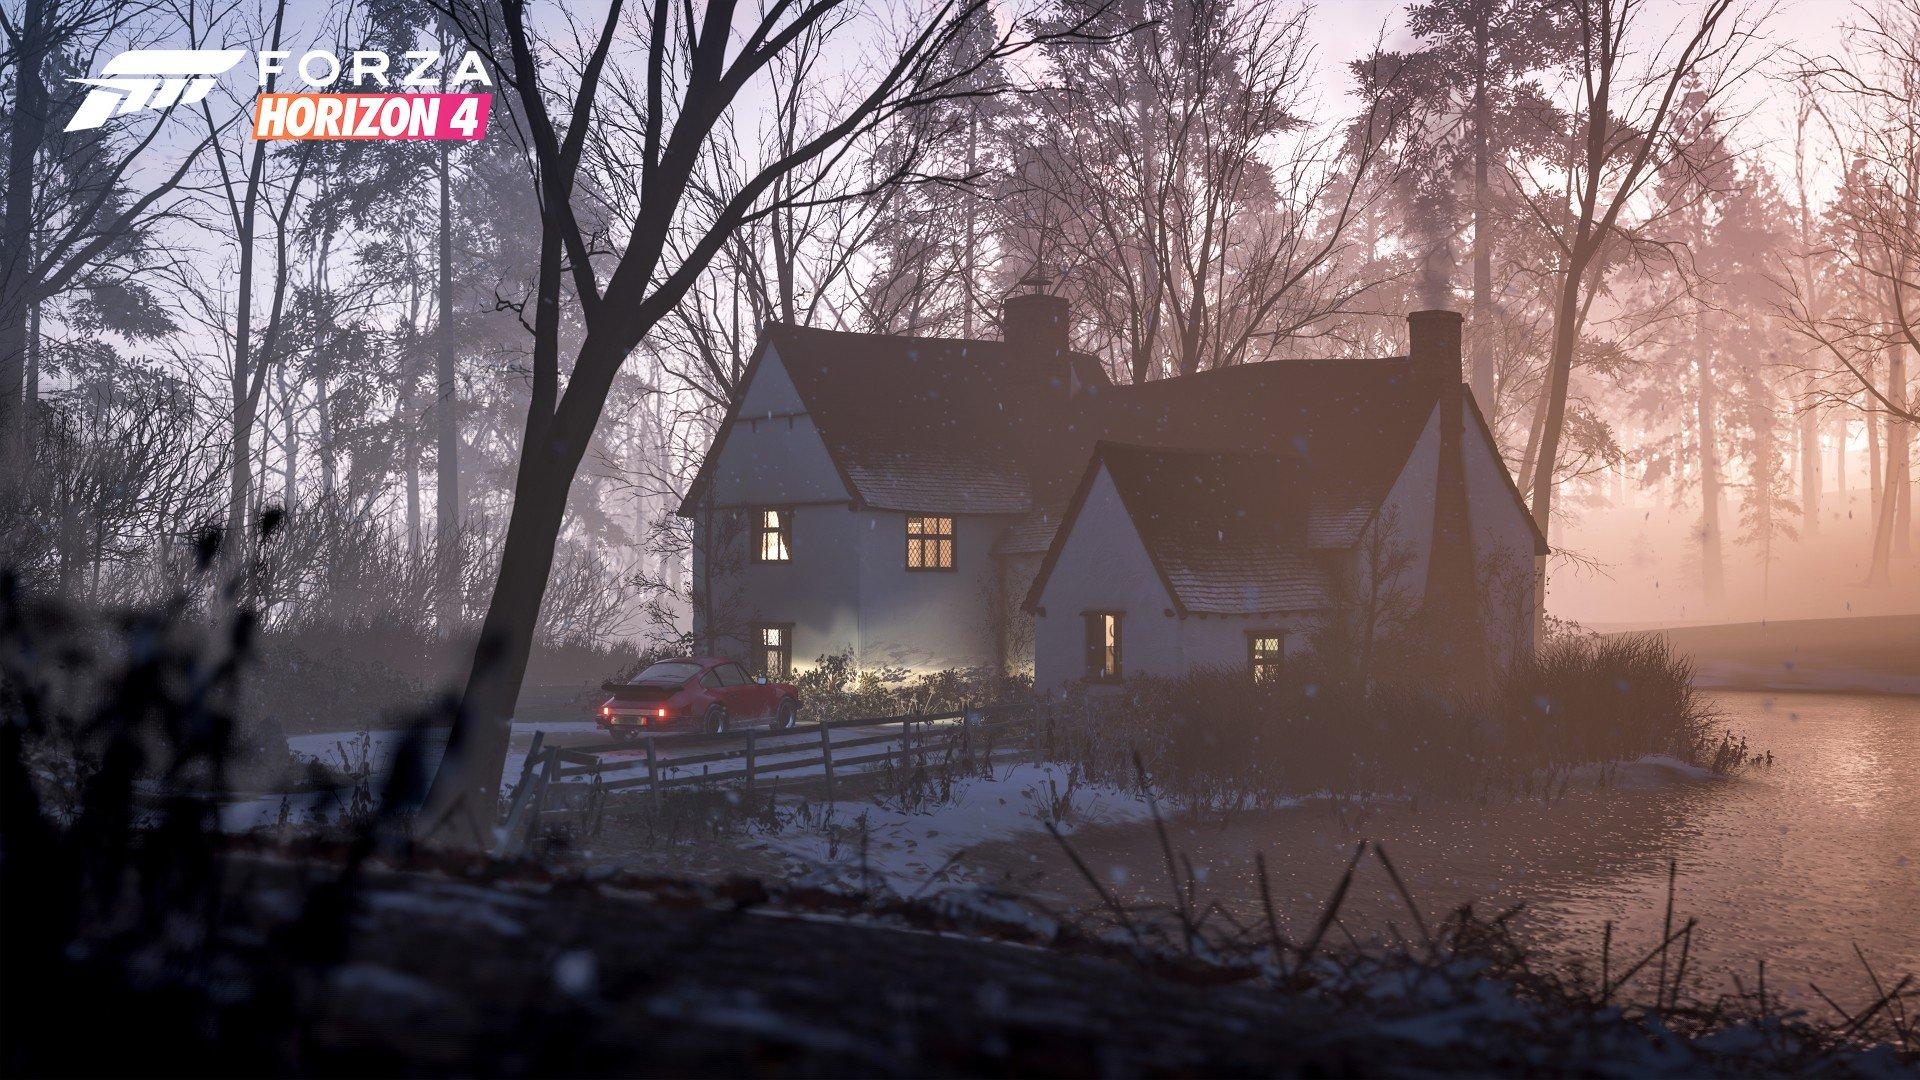 Forza Horizon 4 Demo keyboard issue Forza-Horizon-4_Winter-House-1.jpg